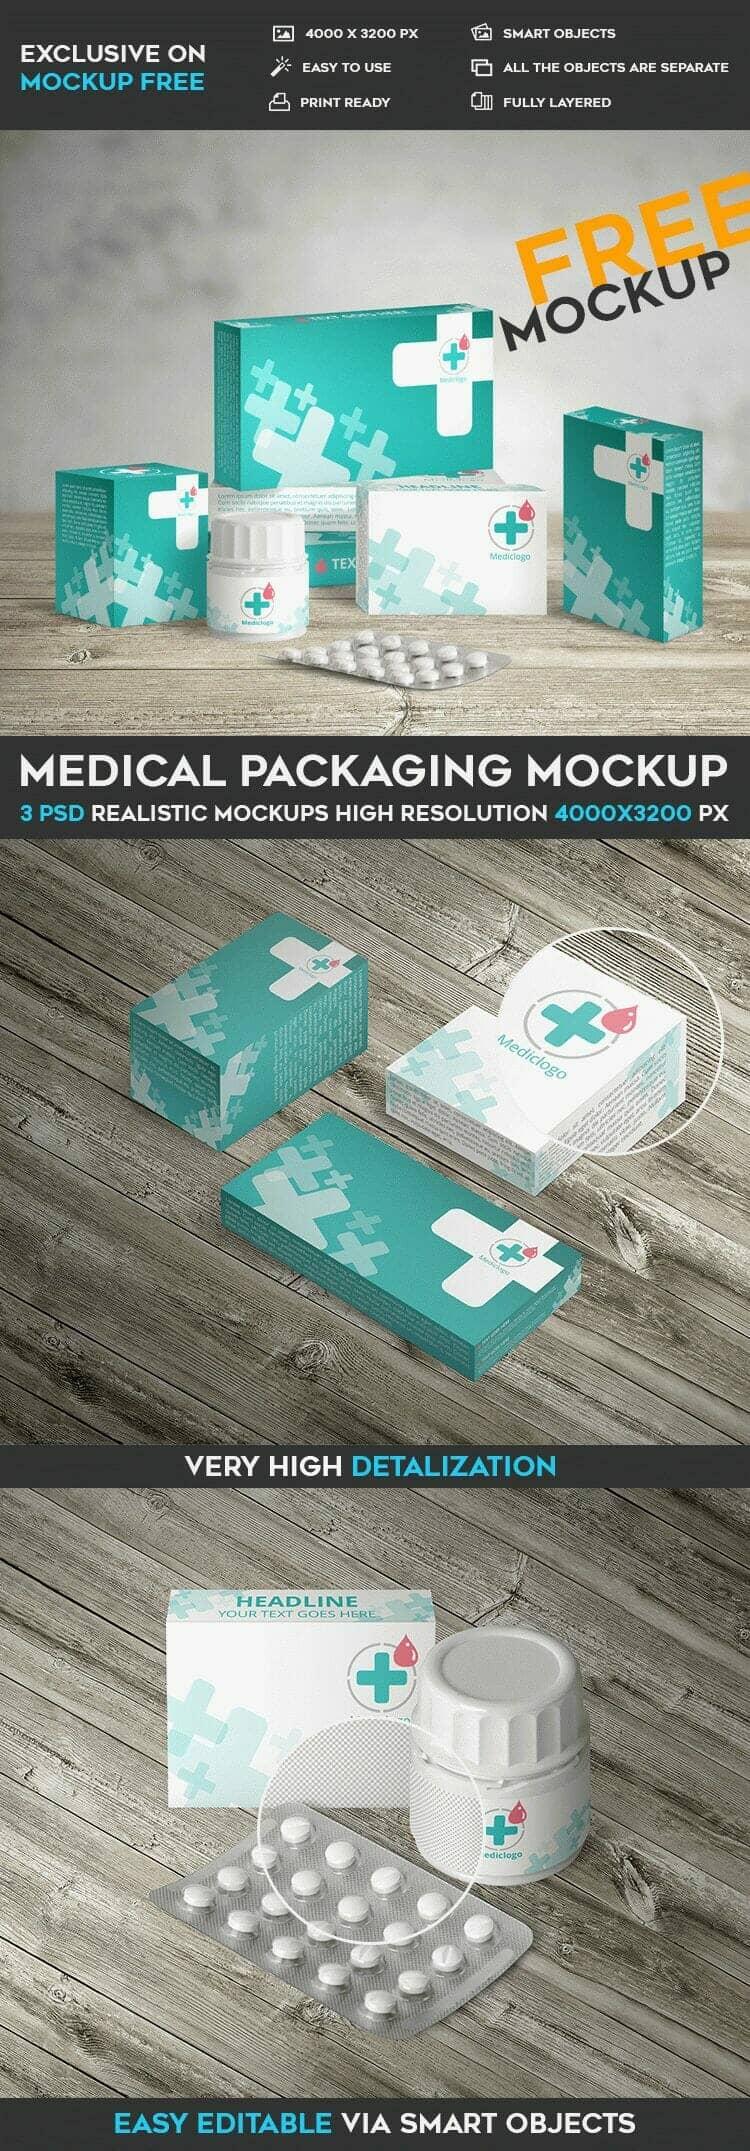 Free Medical Packaging Mockup